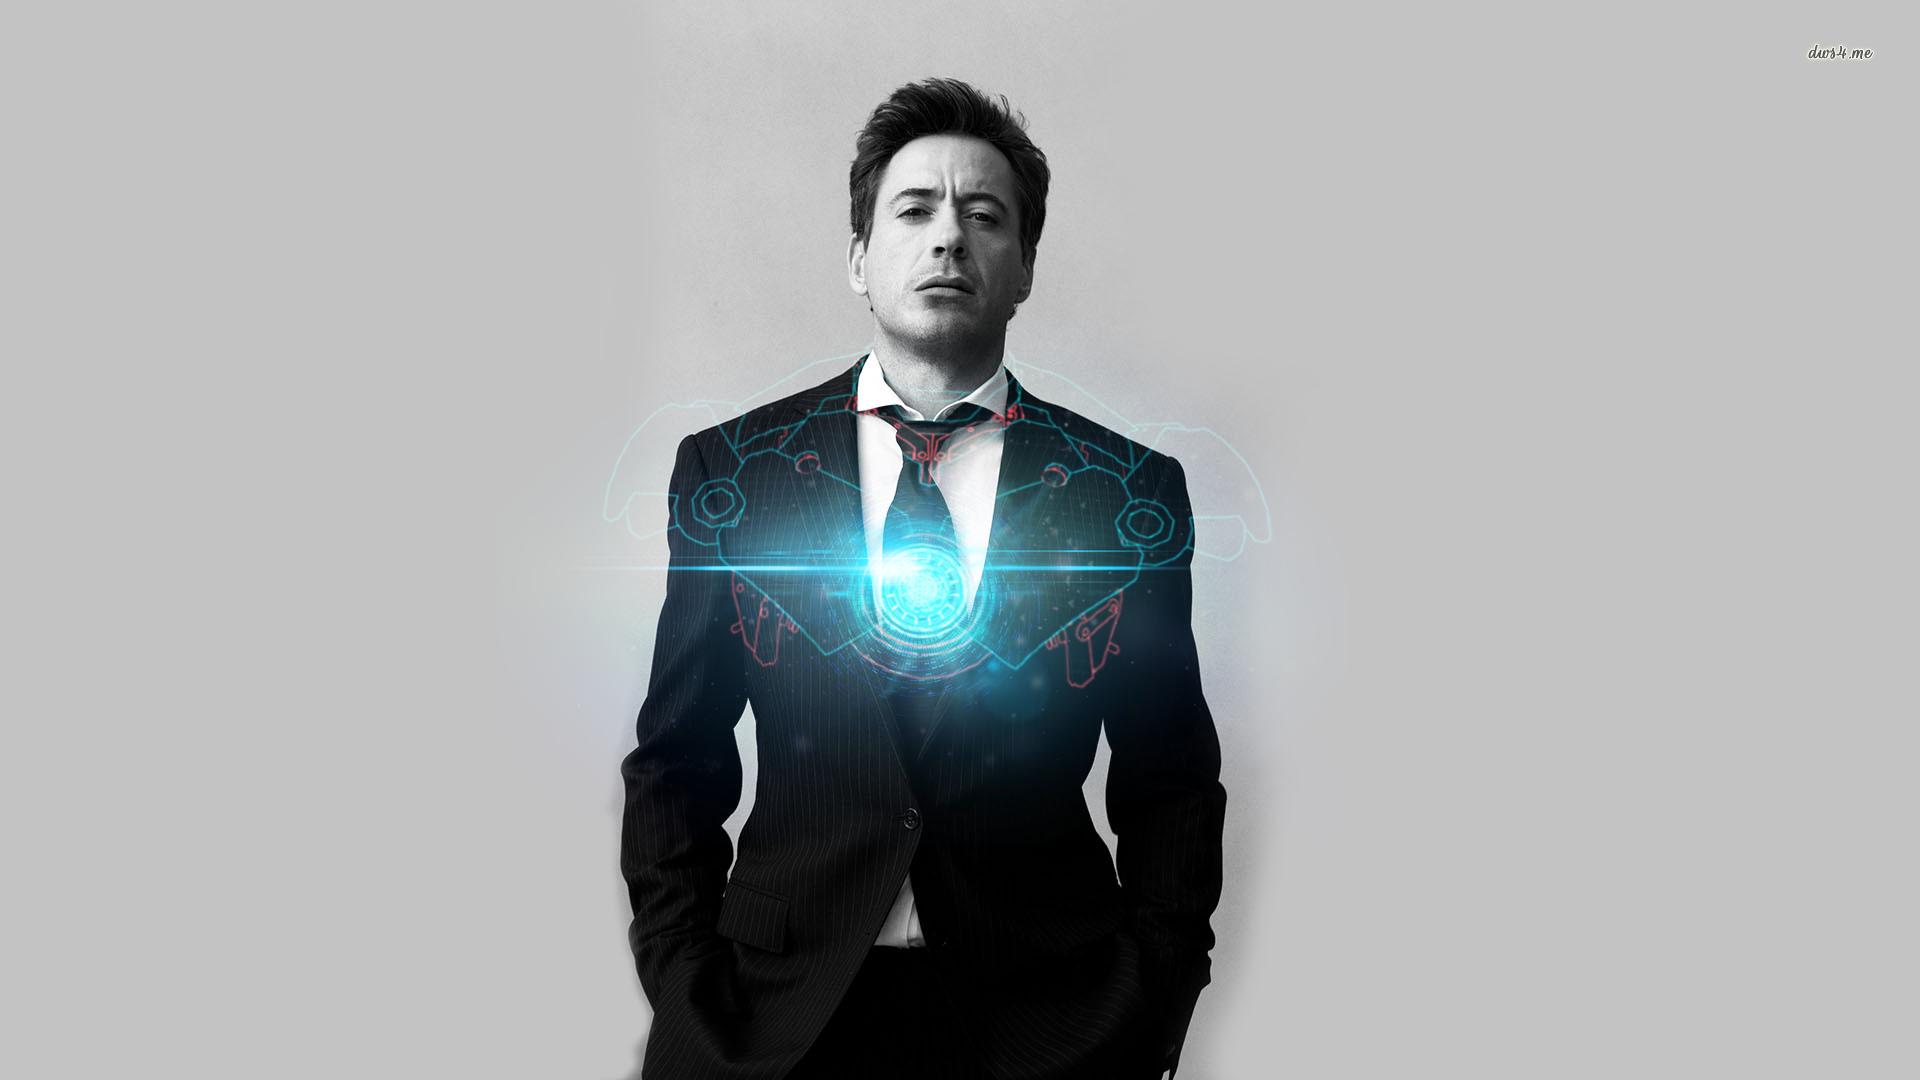 Tony Stark Wallpapers - WallpaperSafari Iron Man 3 Arc Reactor Logo